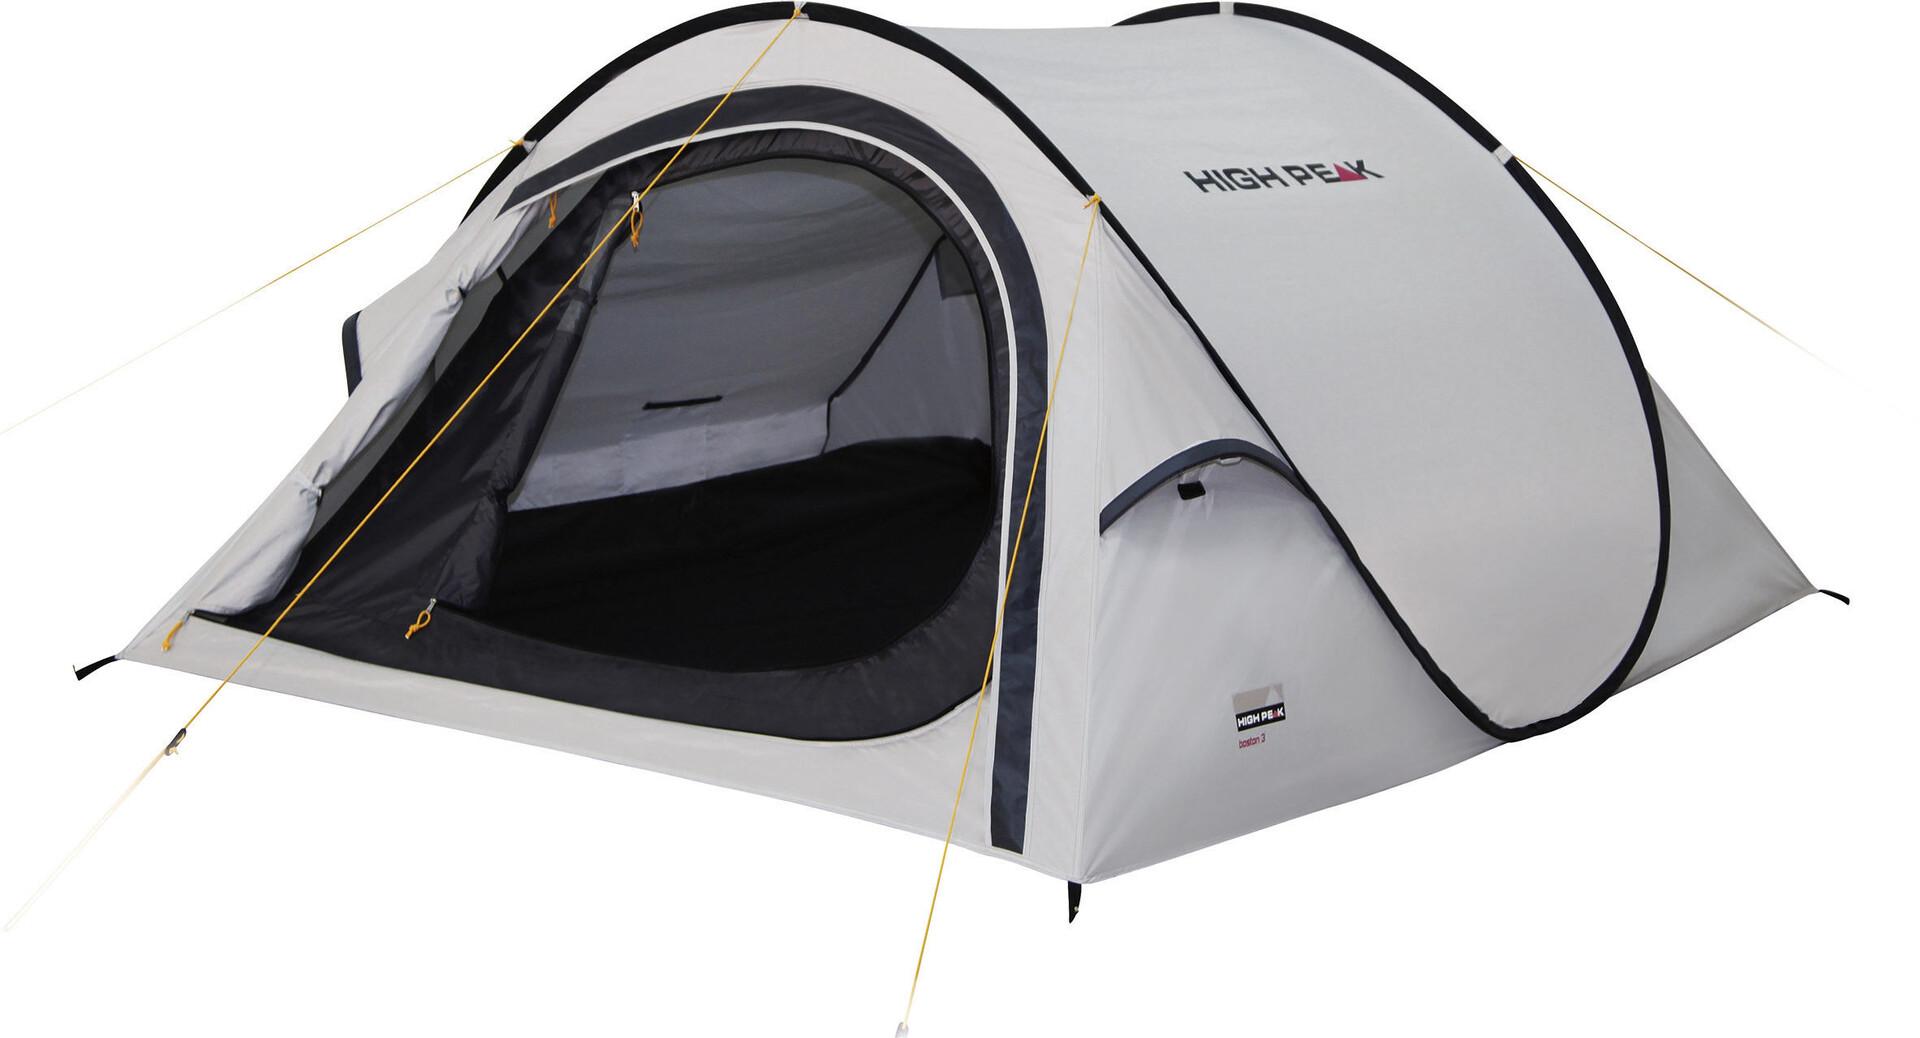 High Peak Boston 2 Tent aluminiumdark grey   Gode tilbud